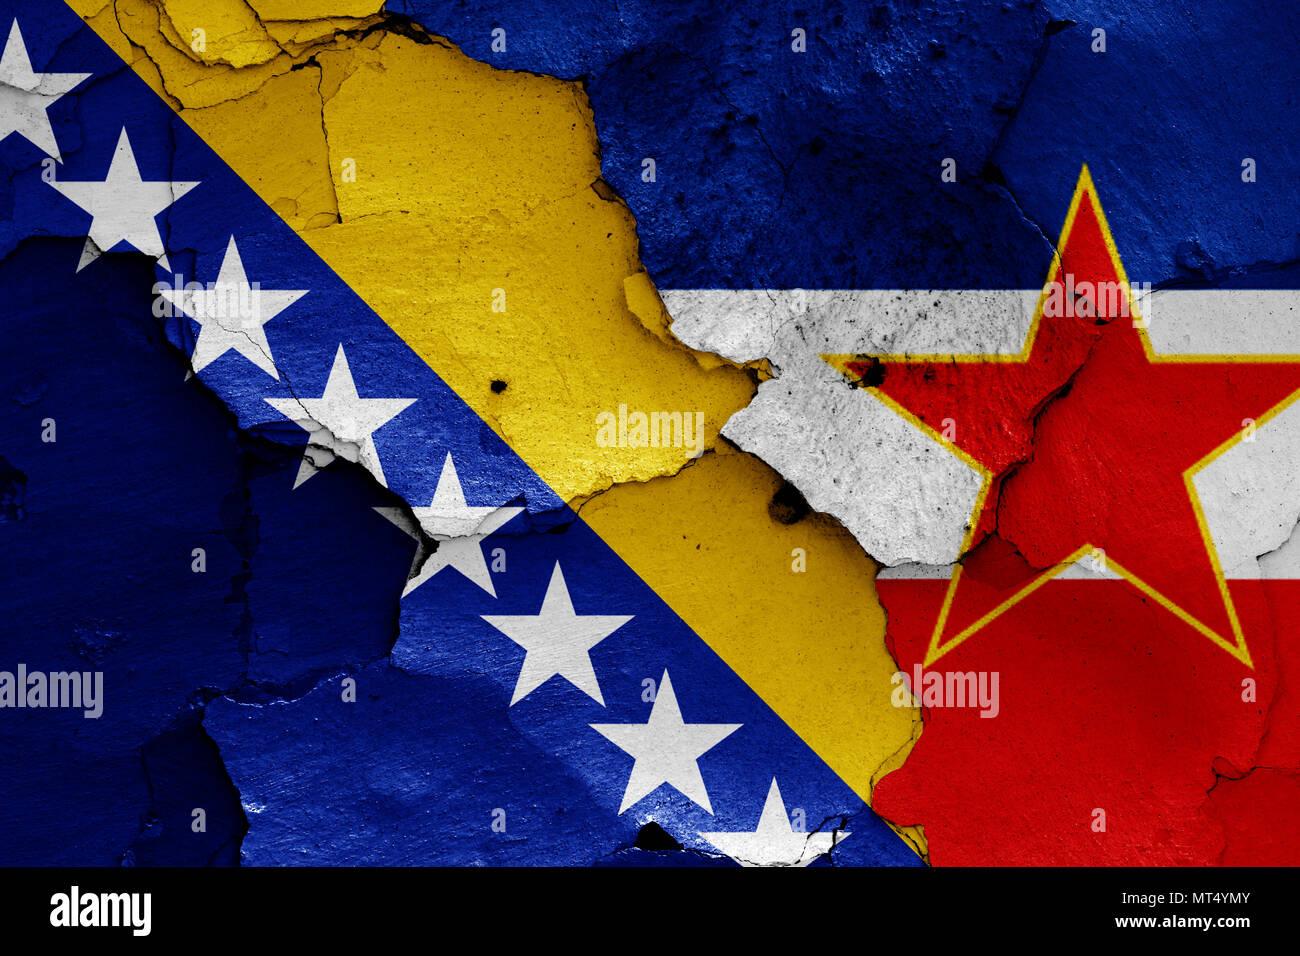 flags of Bosnia & Herzegovina and Yugoslavia - Stock Image